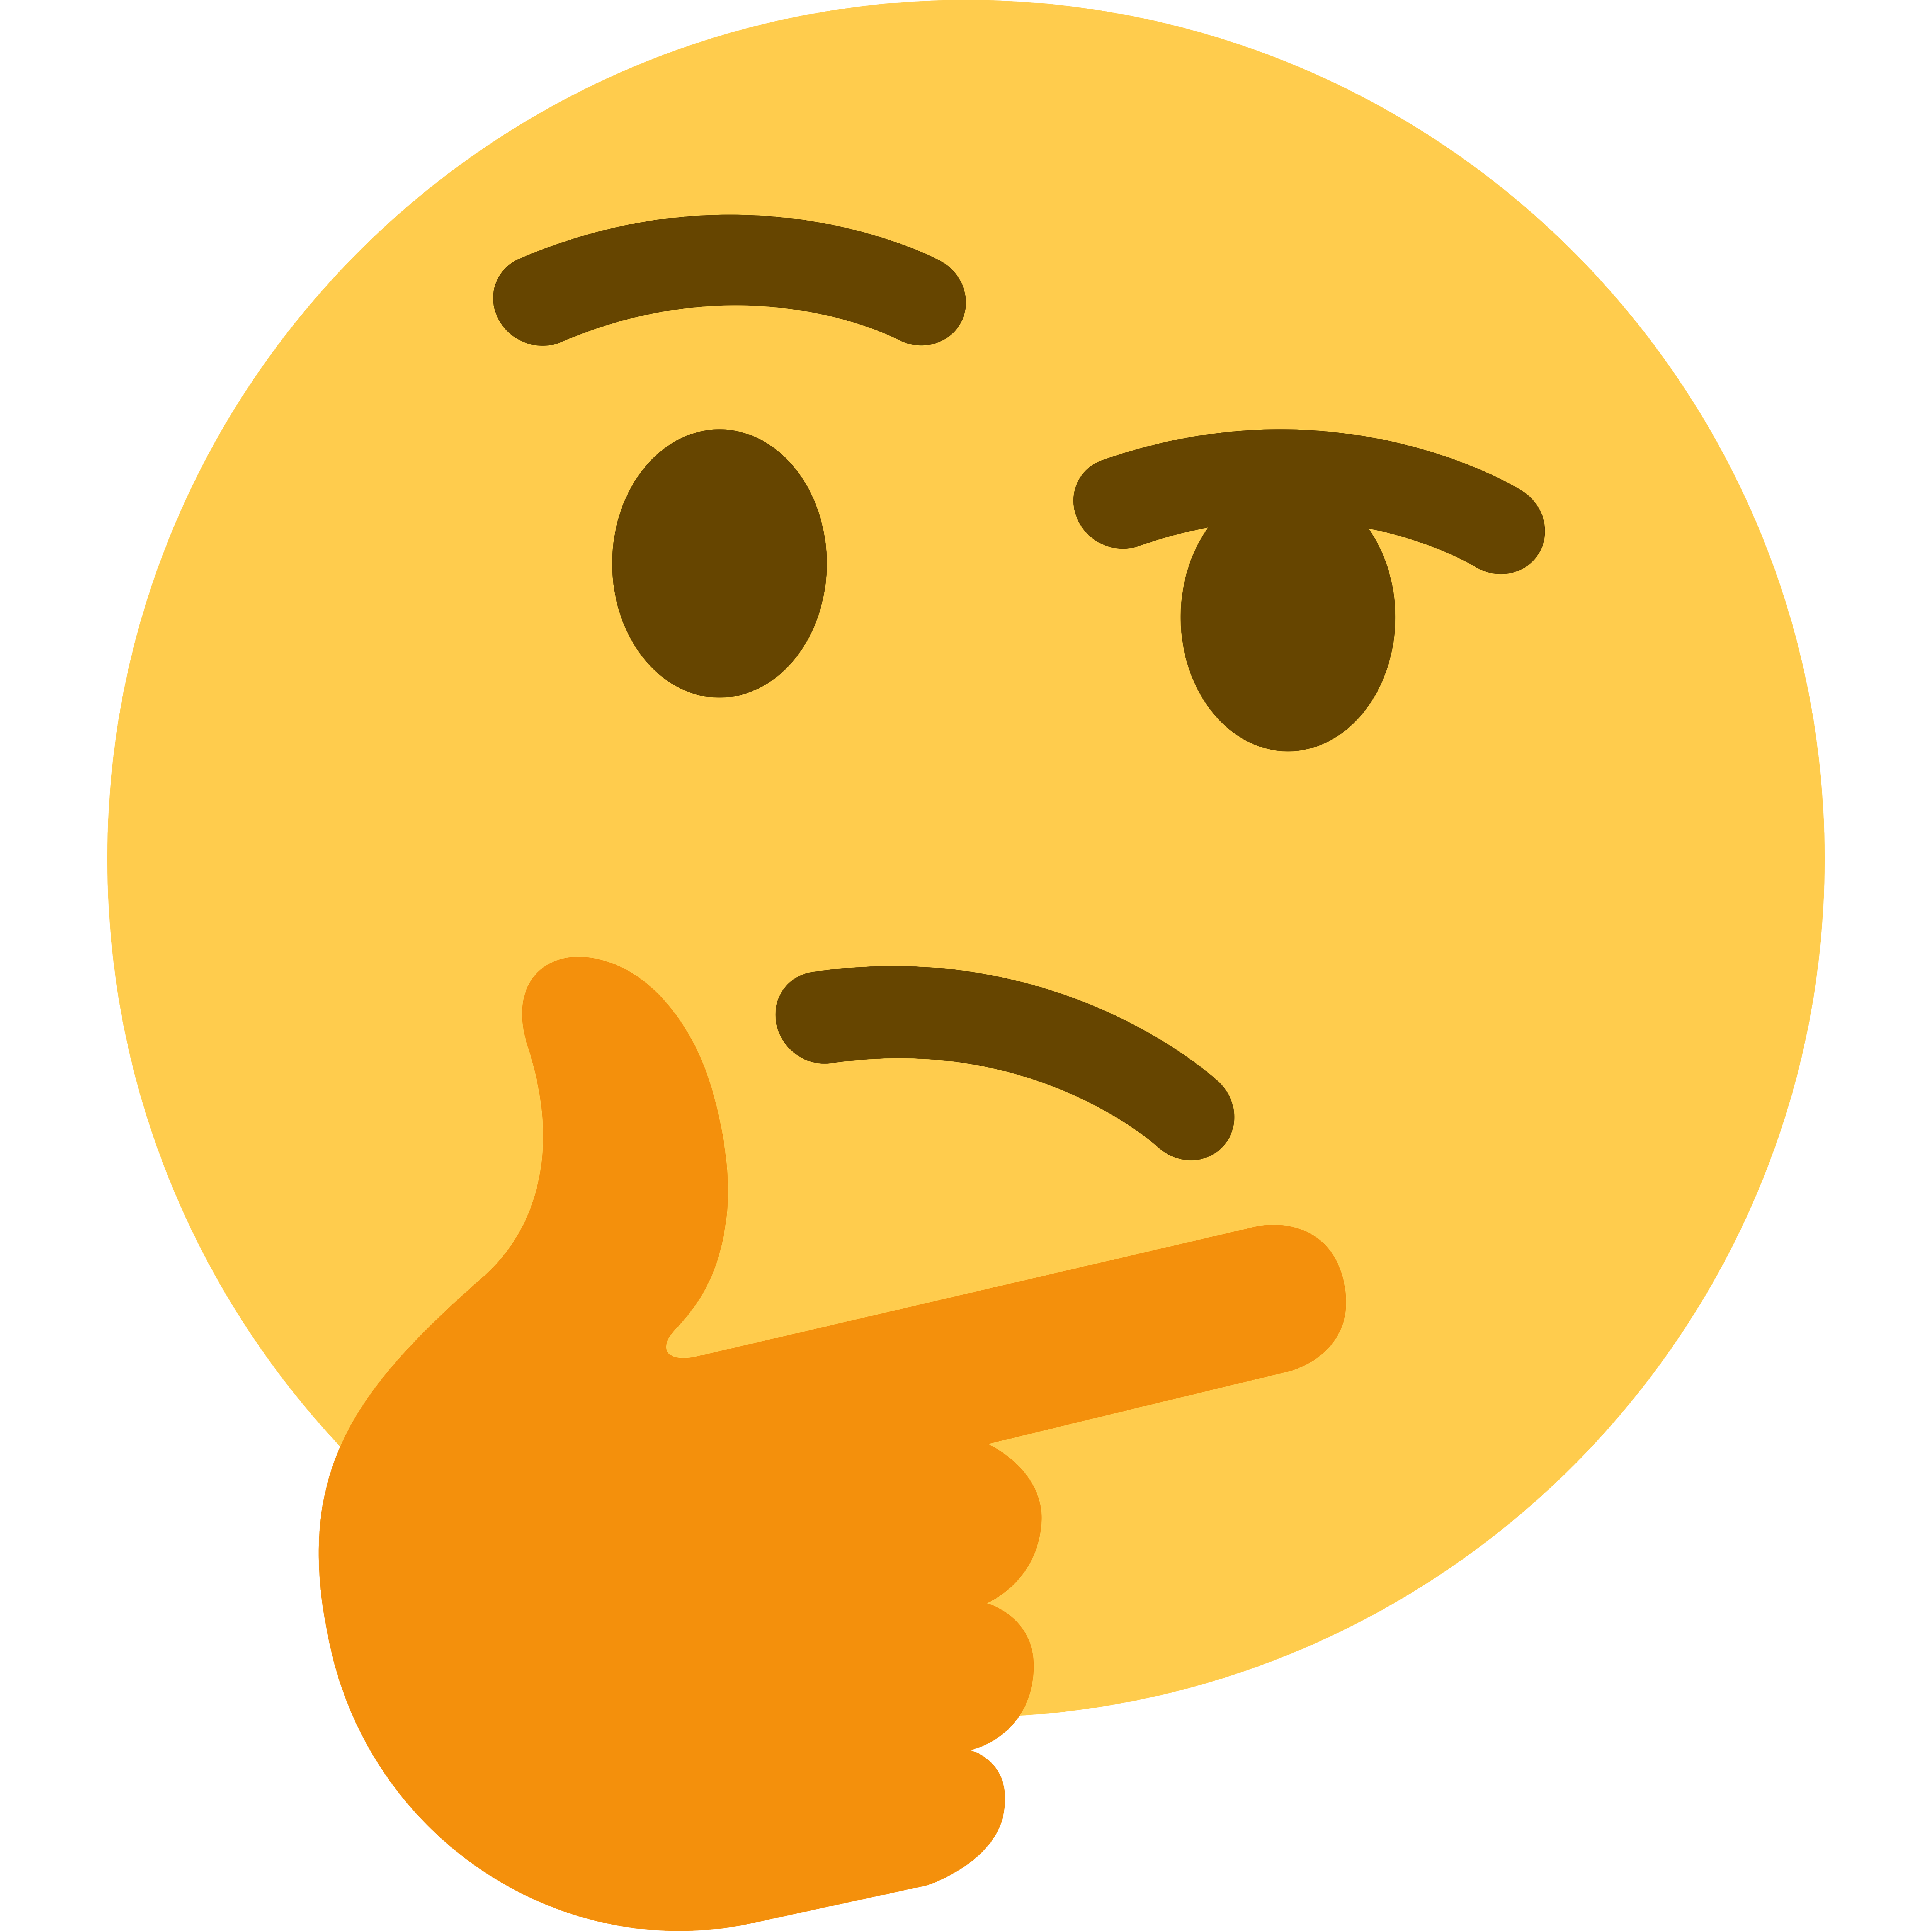 Hmm PNG